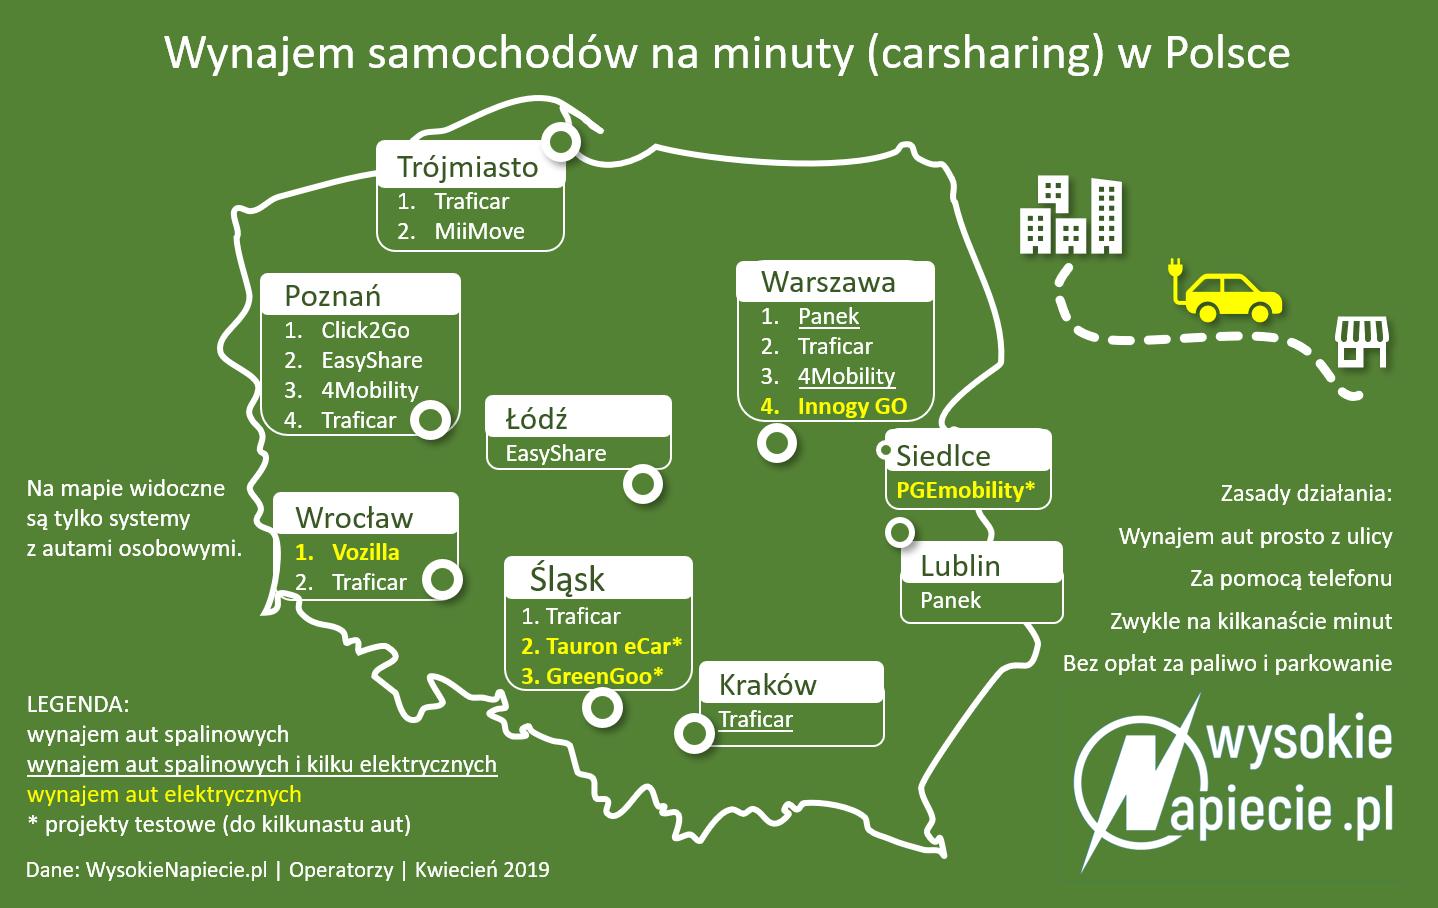 carsharing Polska 2019